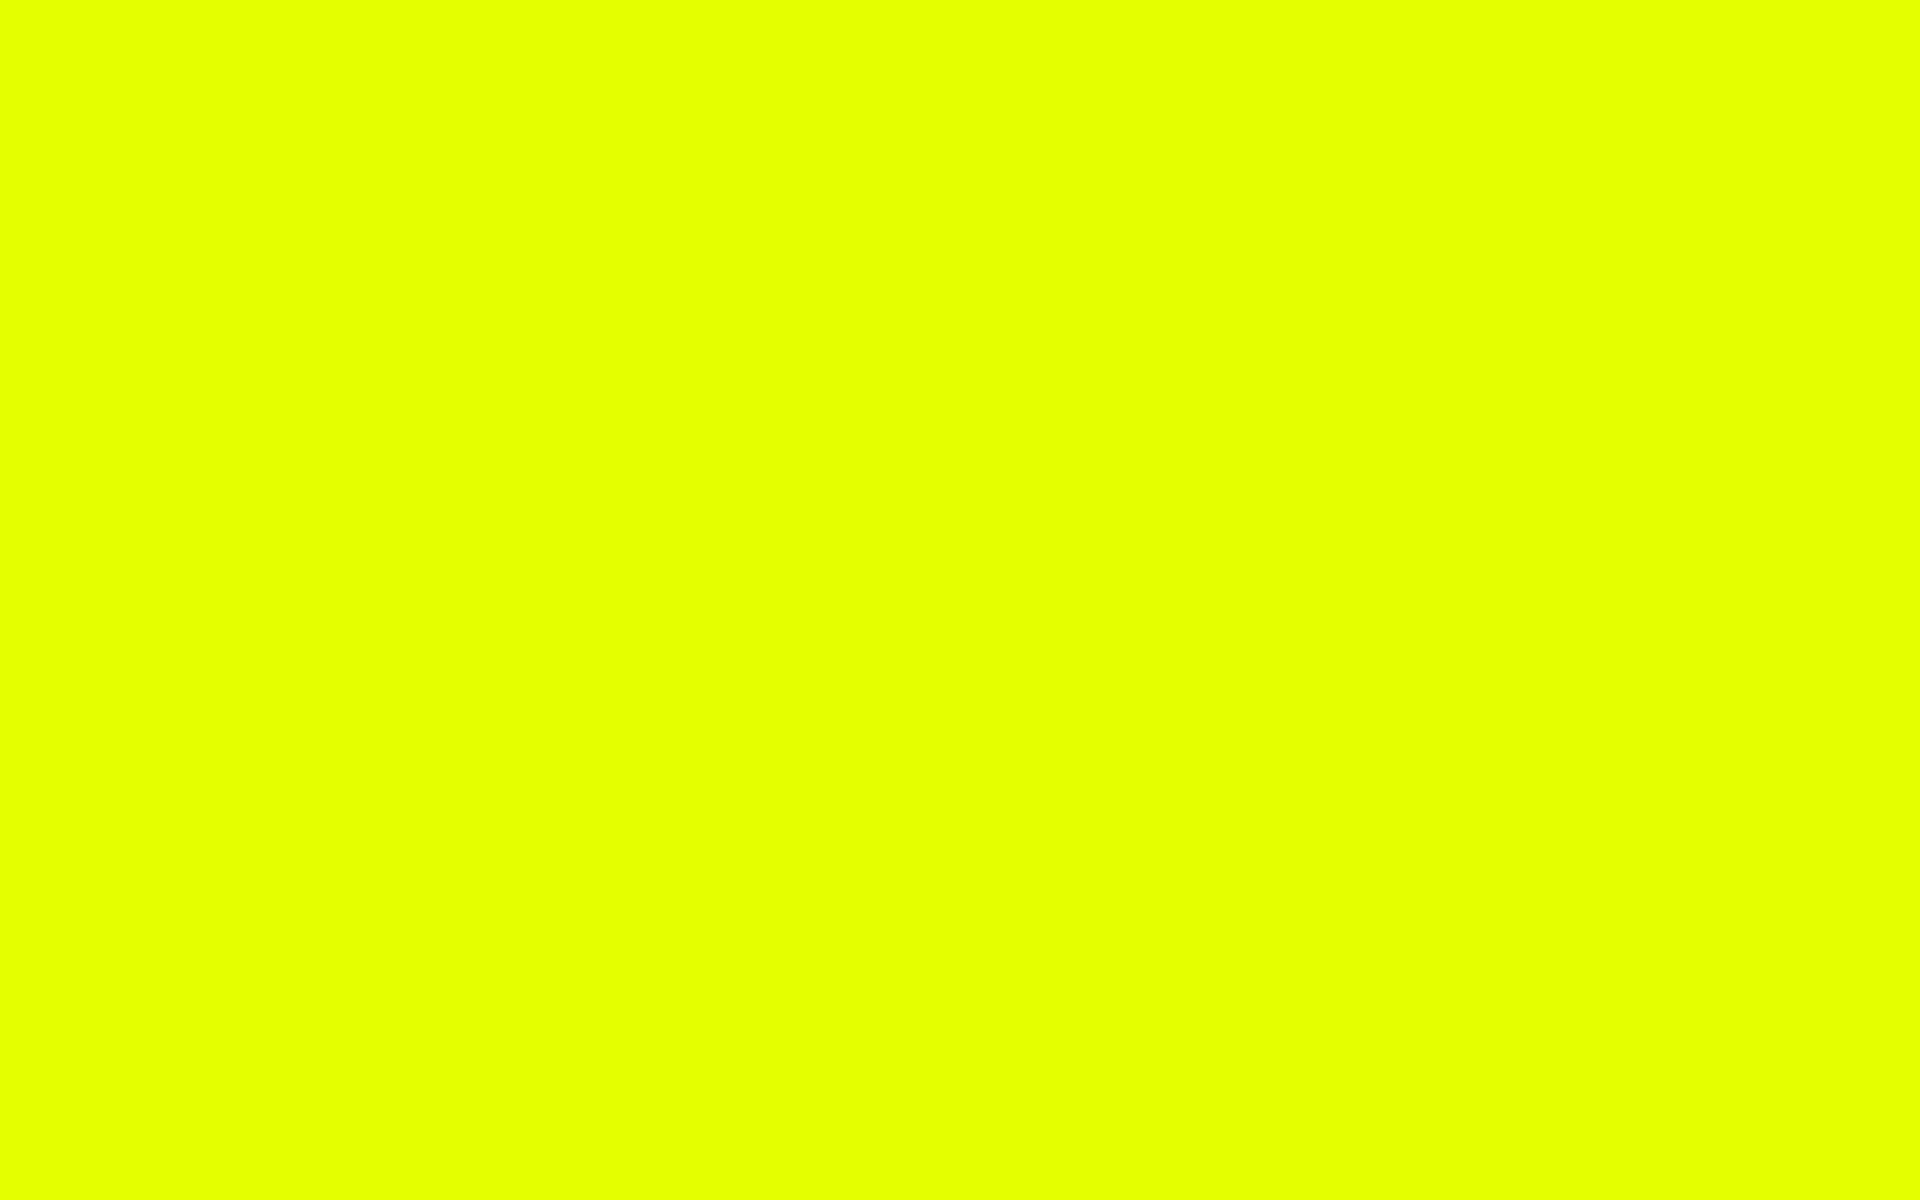 1920x1200 Lemon Lime Solid Color Background